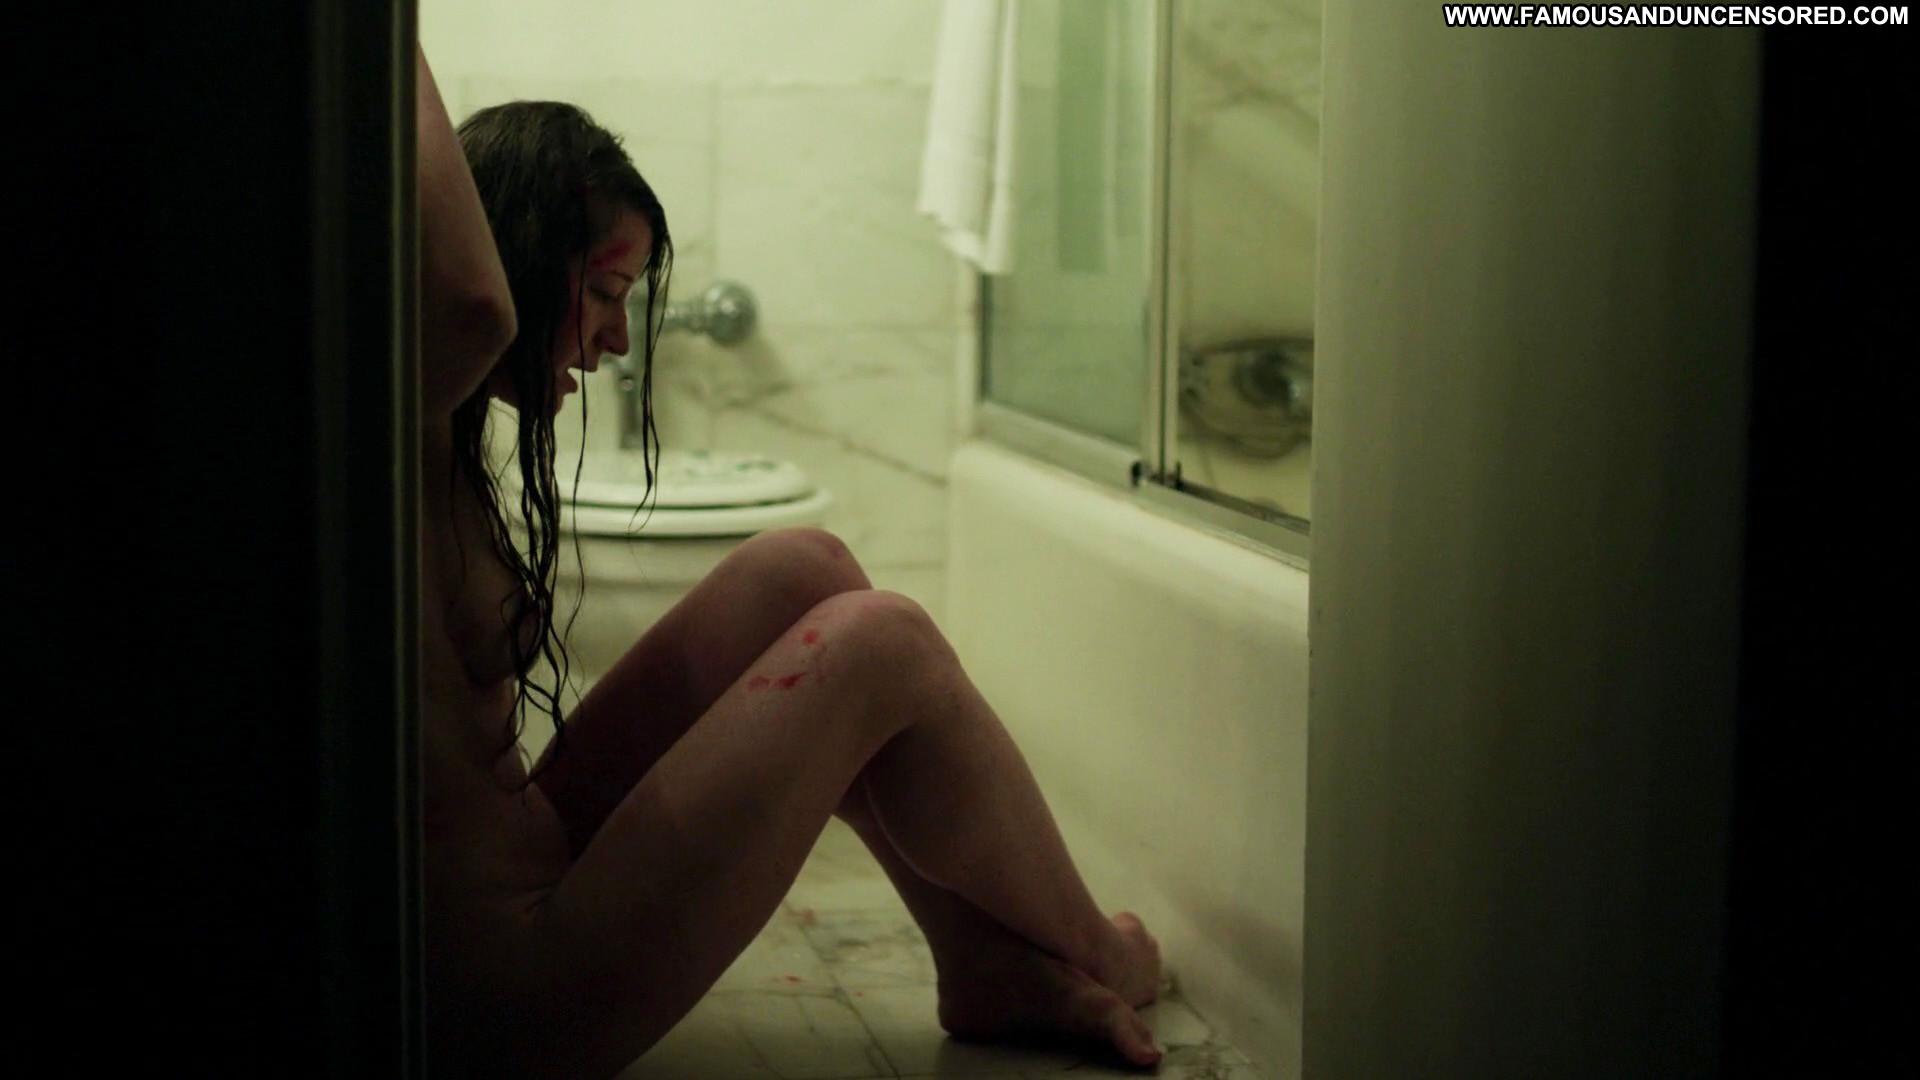 Brooke Bloom Shes Lost Control Celebrity Hot Shower Nude Movie: www.famousanduncensored.com/ncv/1434474729-brooke-bloom-shes-lost...